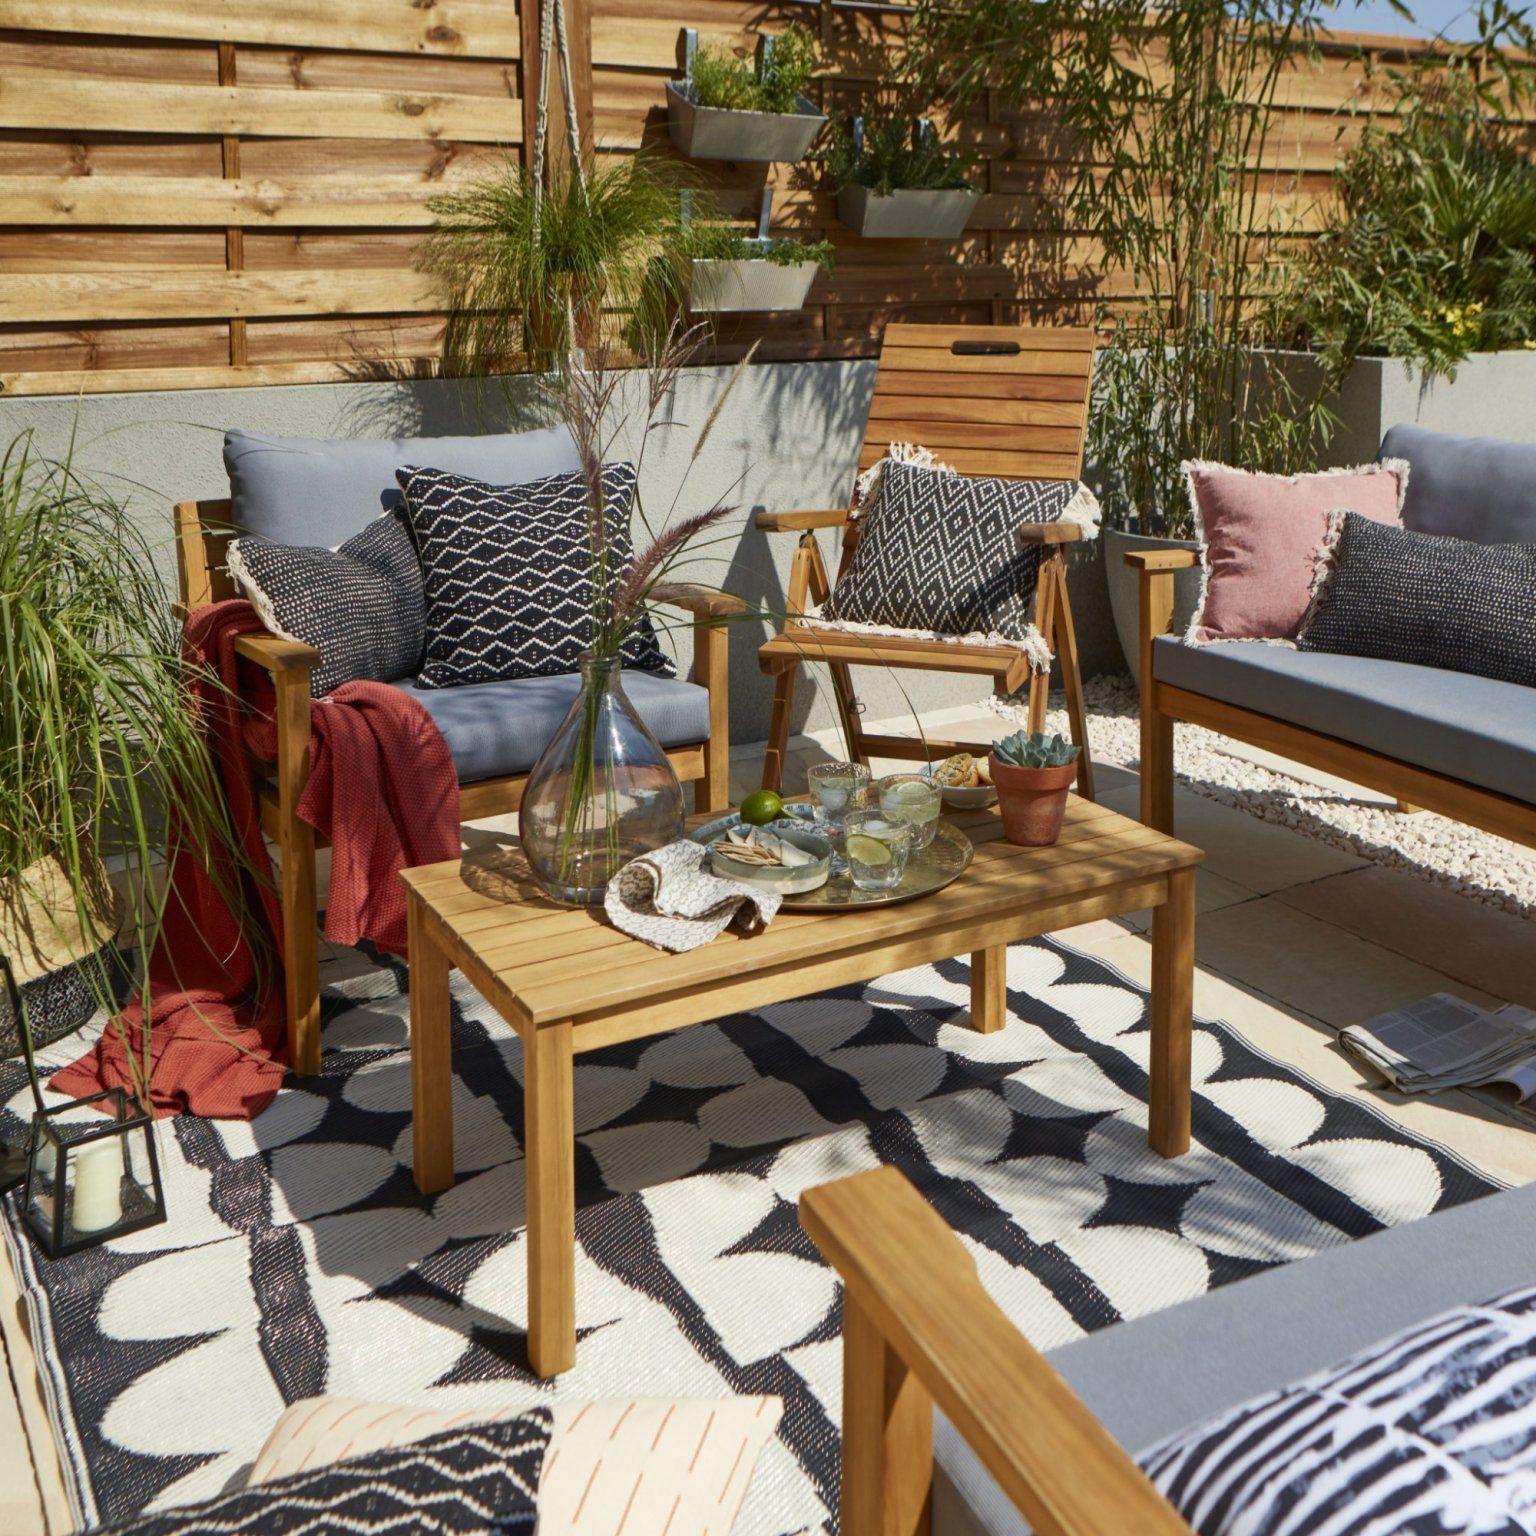 15 Salons De Jardin Quali À Prix Mini ! | Agrément De Jardin ... avec Petit Salon De Jardin Pas Cher